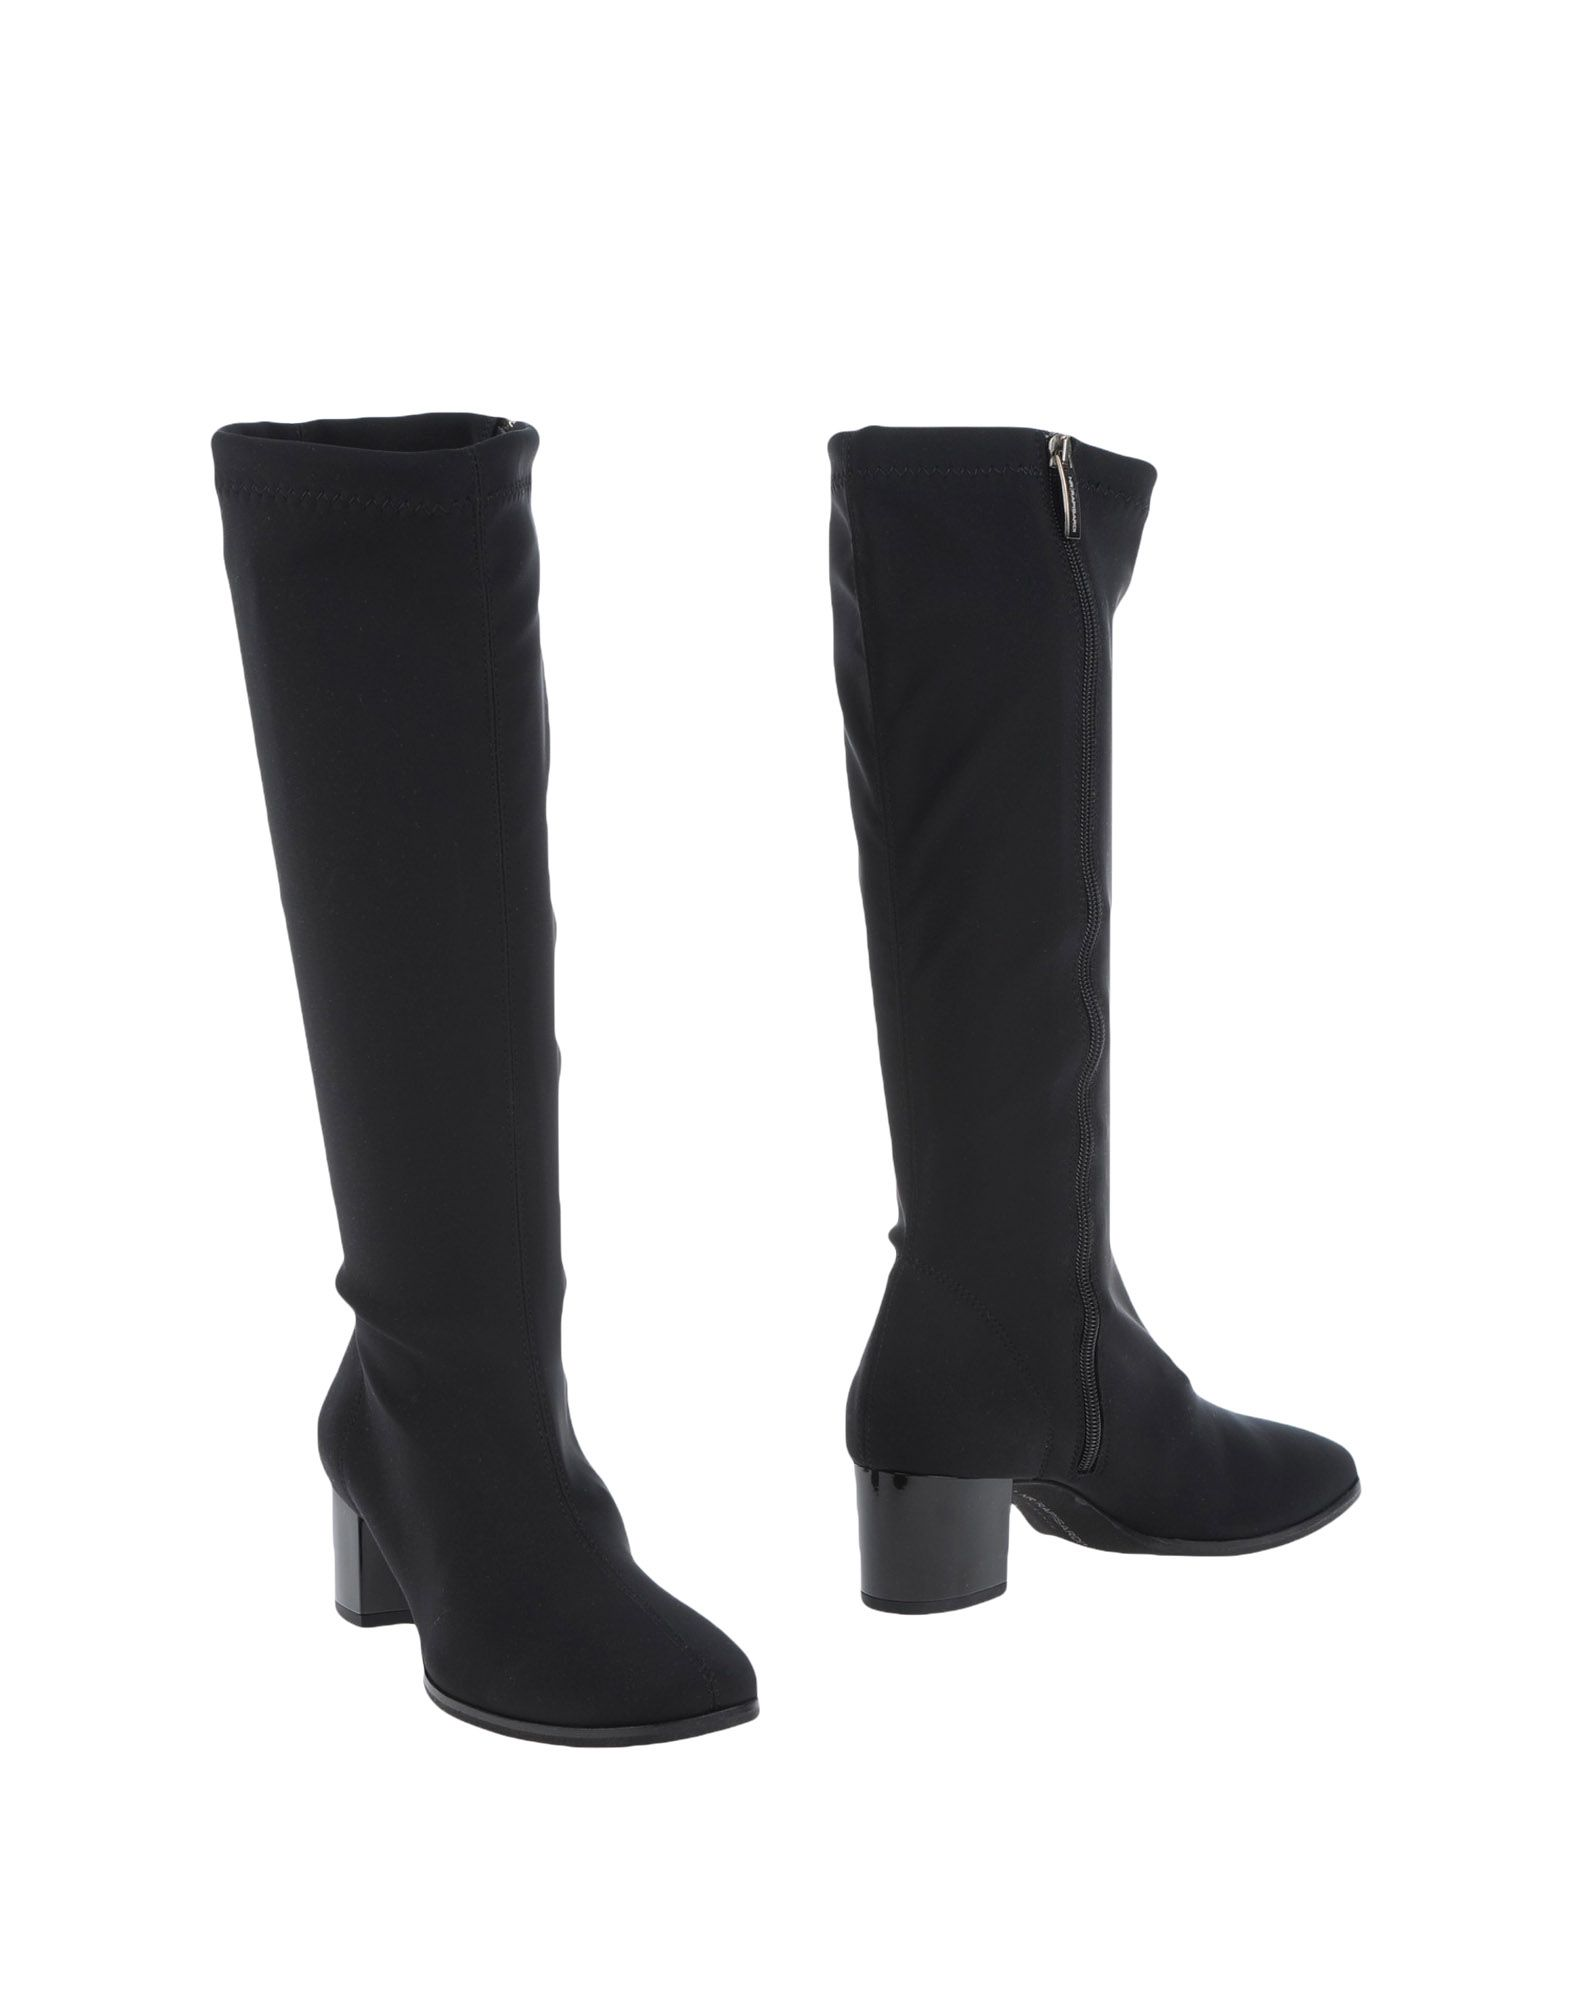 Nr Rapisardi Boots - Women Nr Rapisardi Boots online on 11273874XF  United Kingdom - 11273874XF on 98cab7